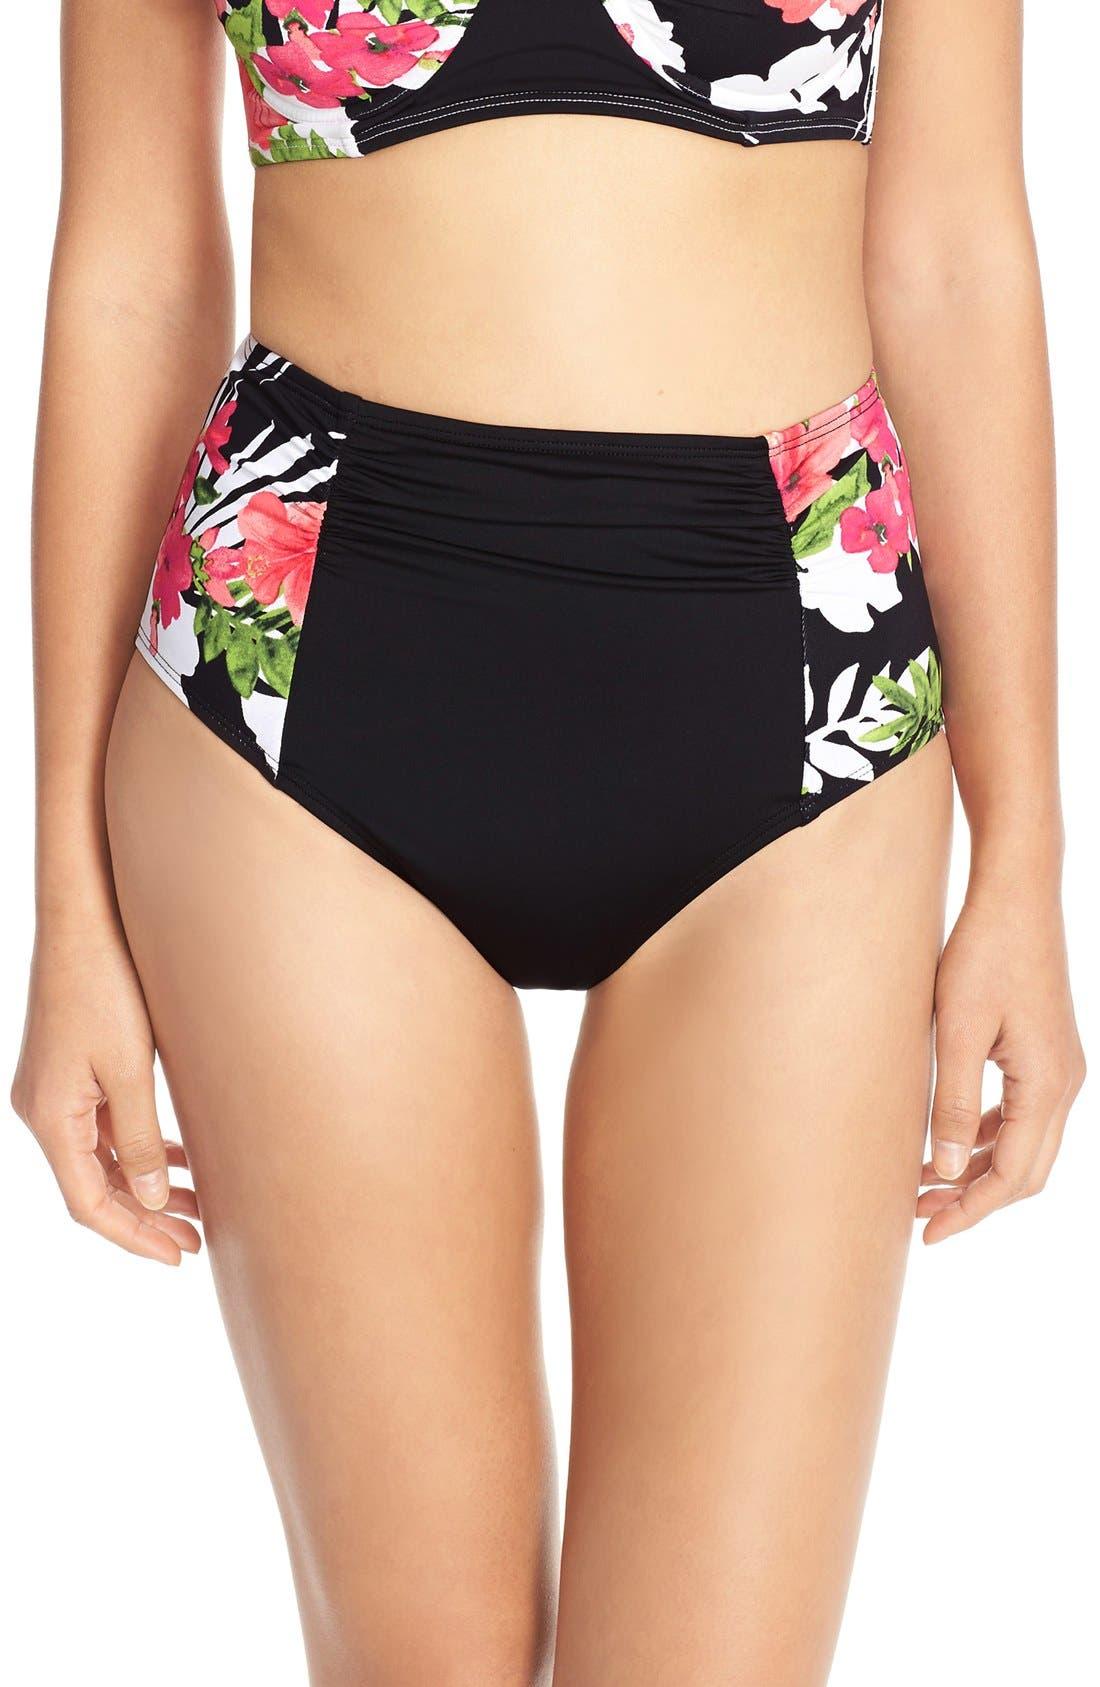 Main Image - Tommy Bahama 'Victory Blooms' High-Waist Bikini Bottoms